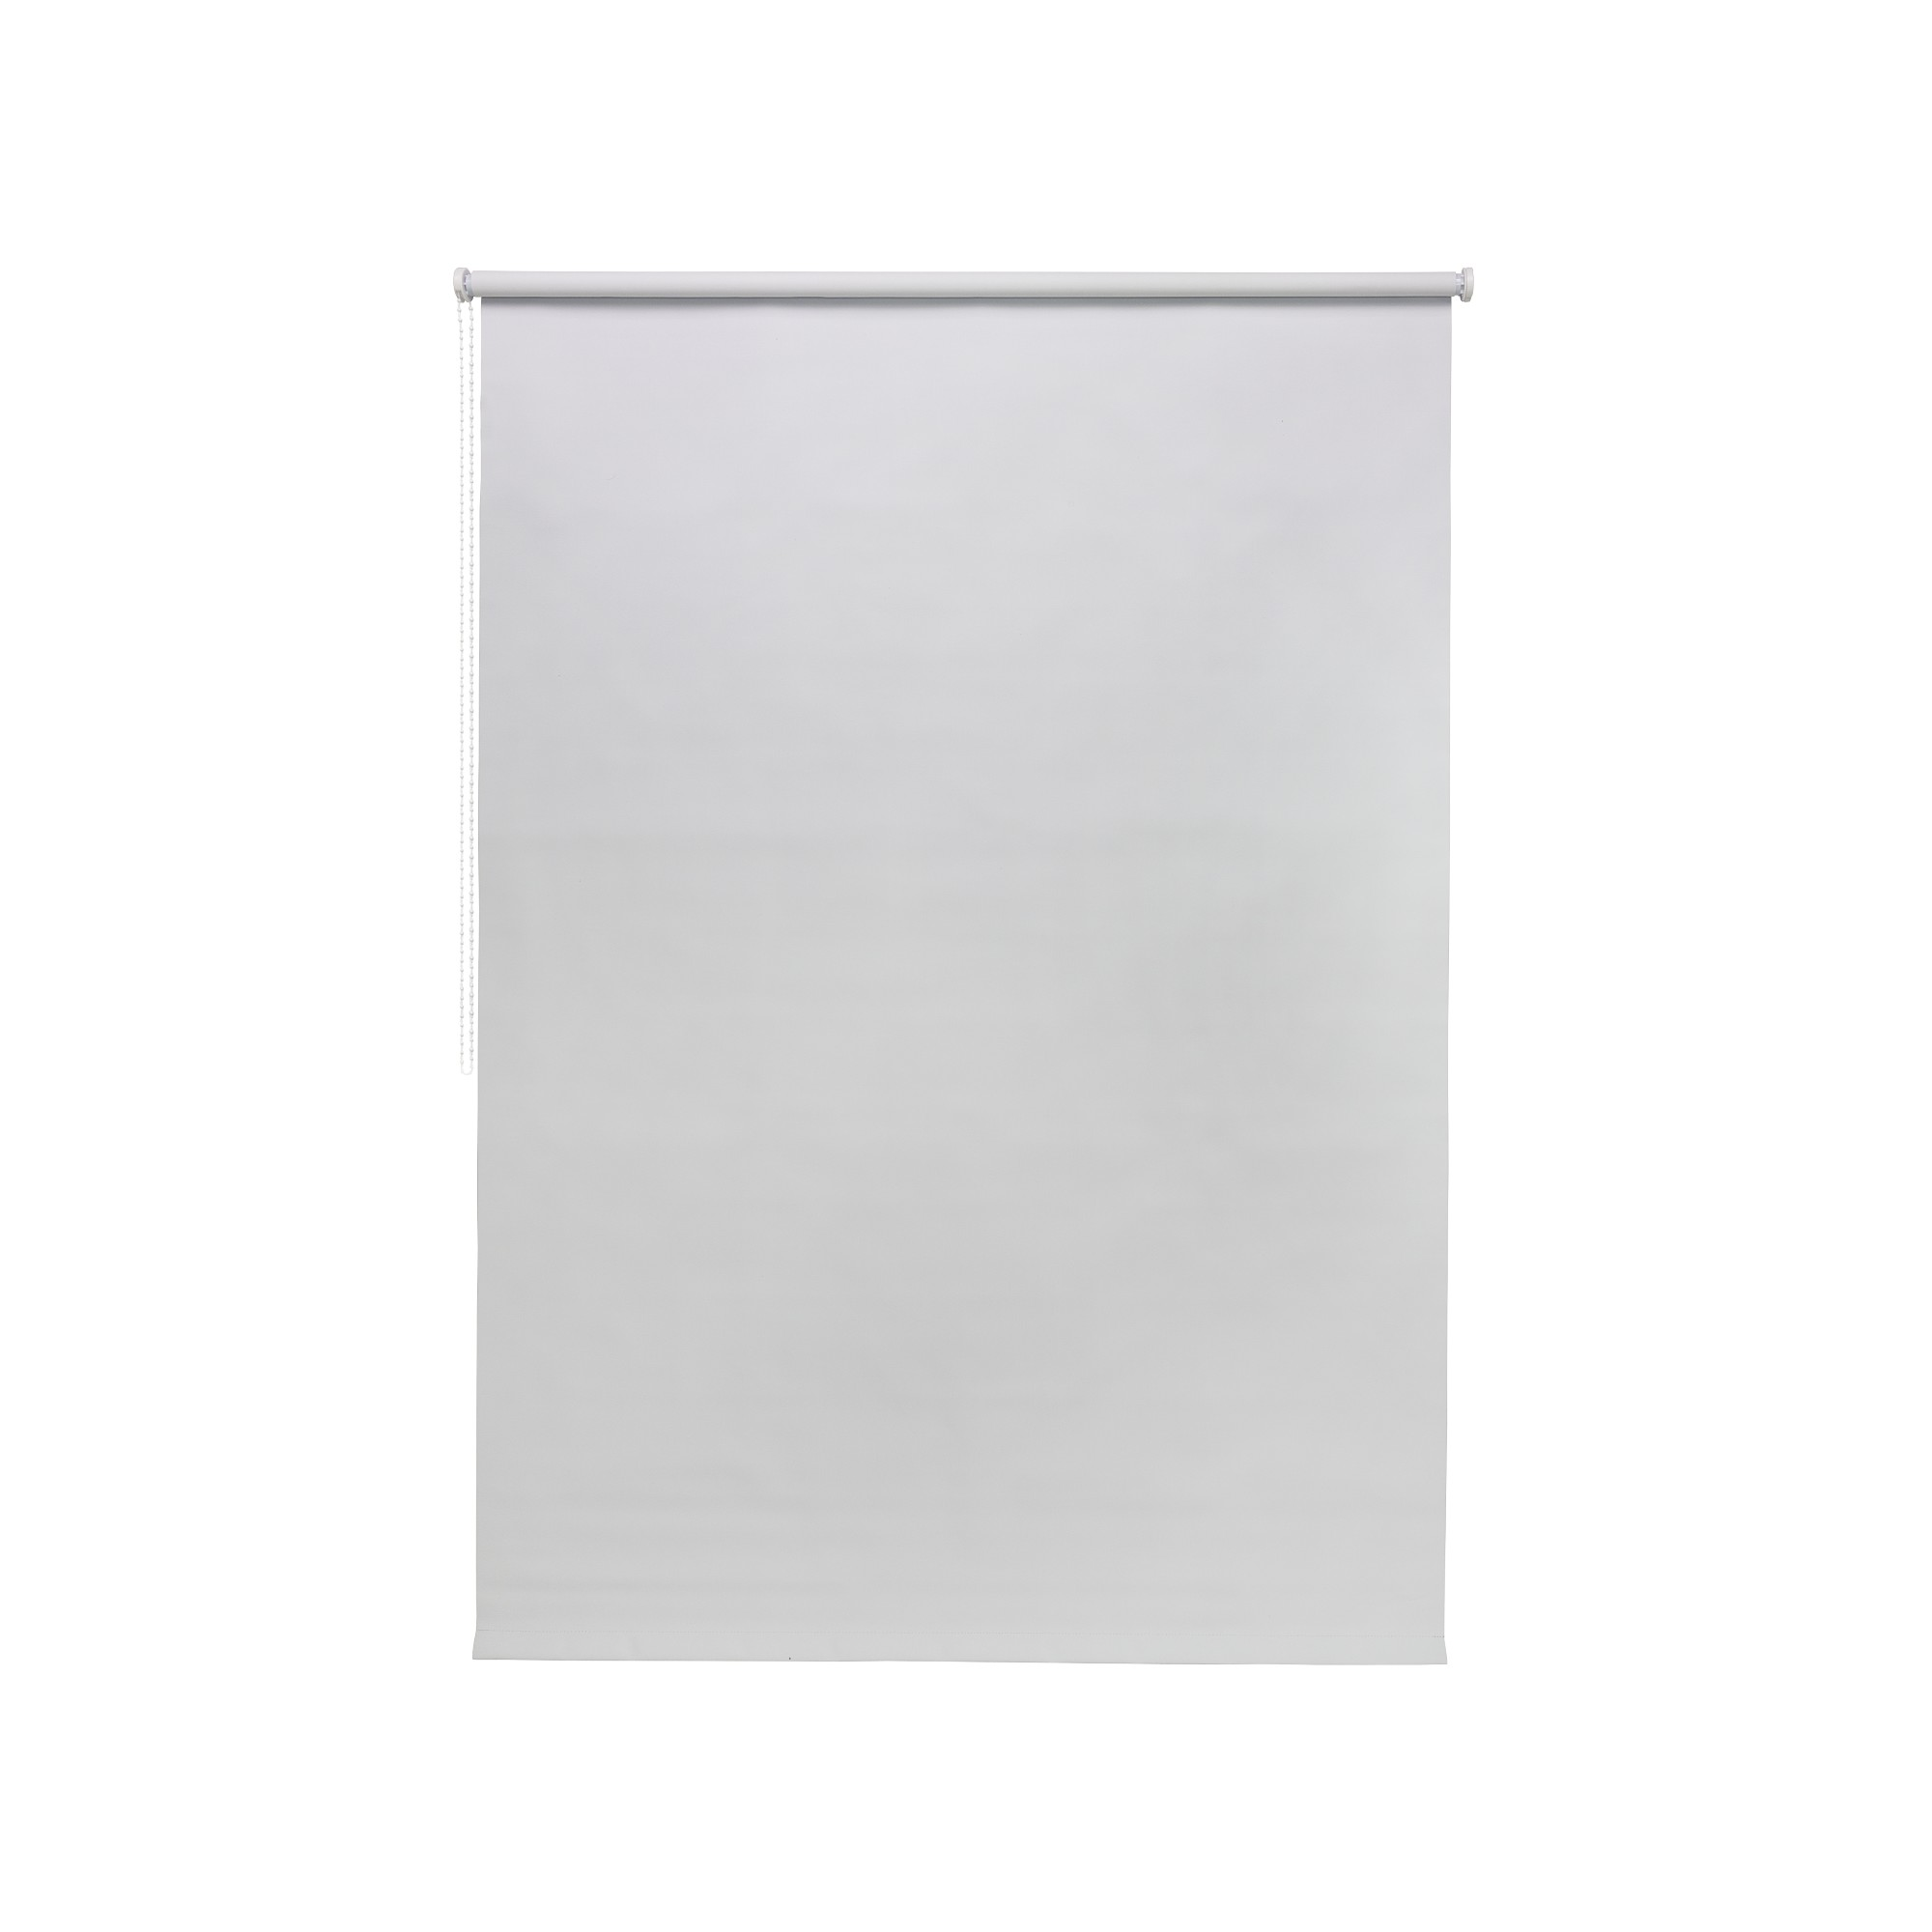 Persiana Rolo Poliester 160x170 cm Branco 7-3 - Jolie